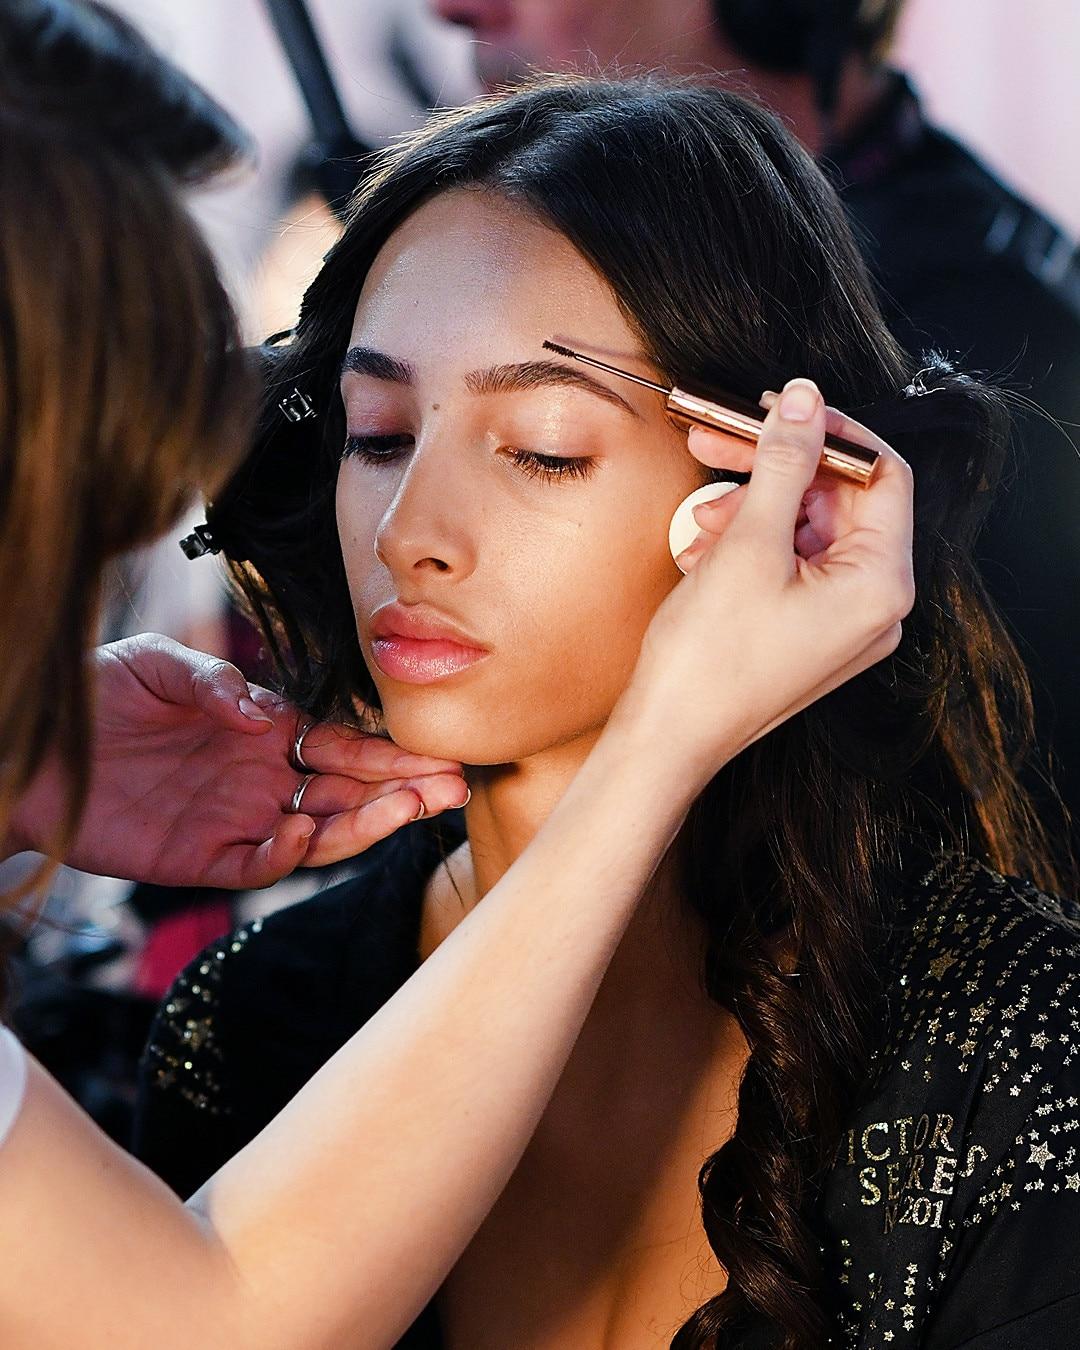 ESC: Victoria's Secret, Yasmin Wijnaldum